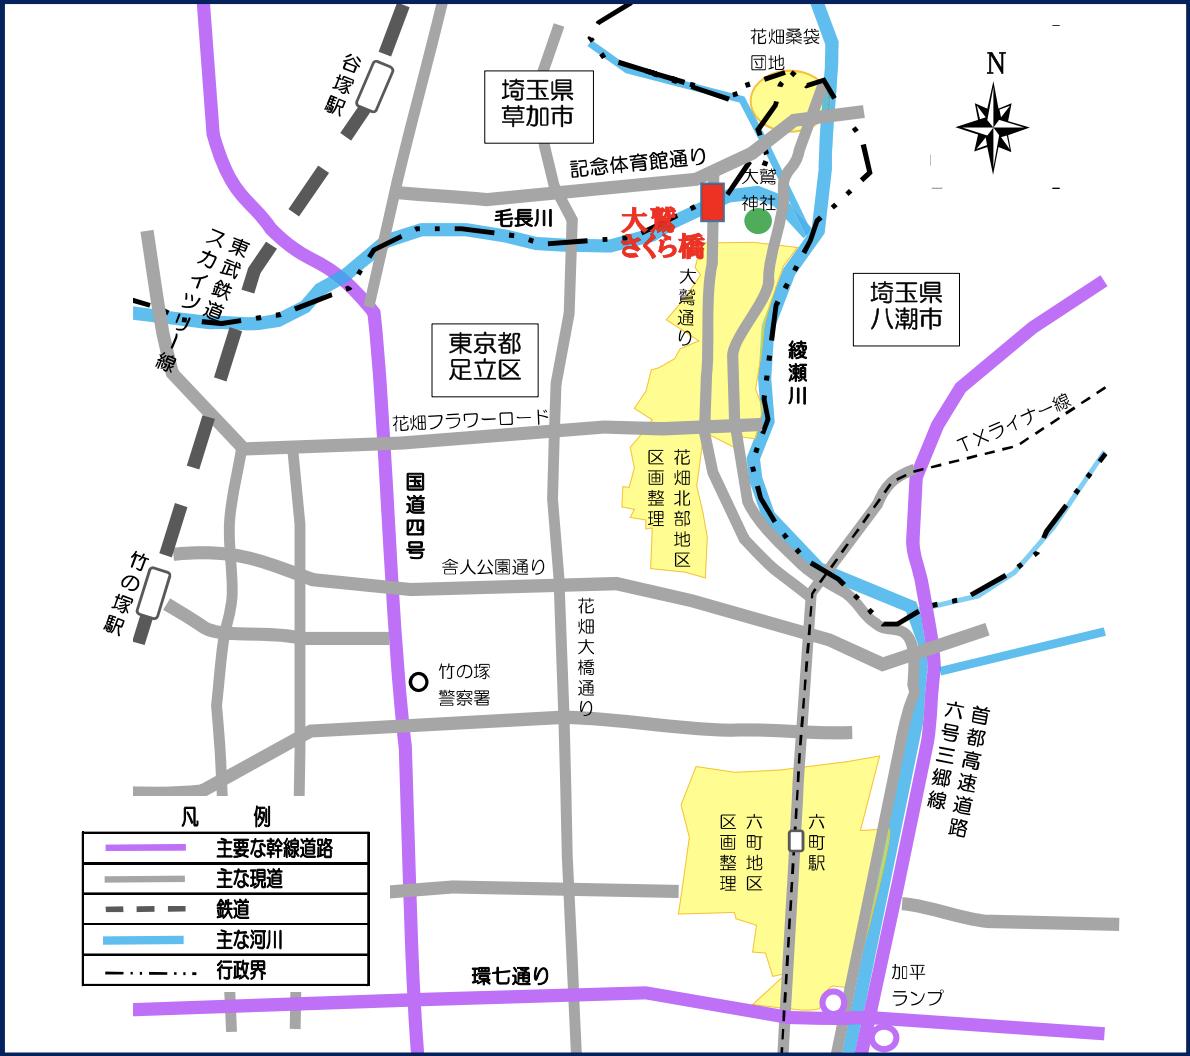 f:id:zakiyamatakashi:20201126194618p:plain